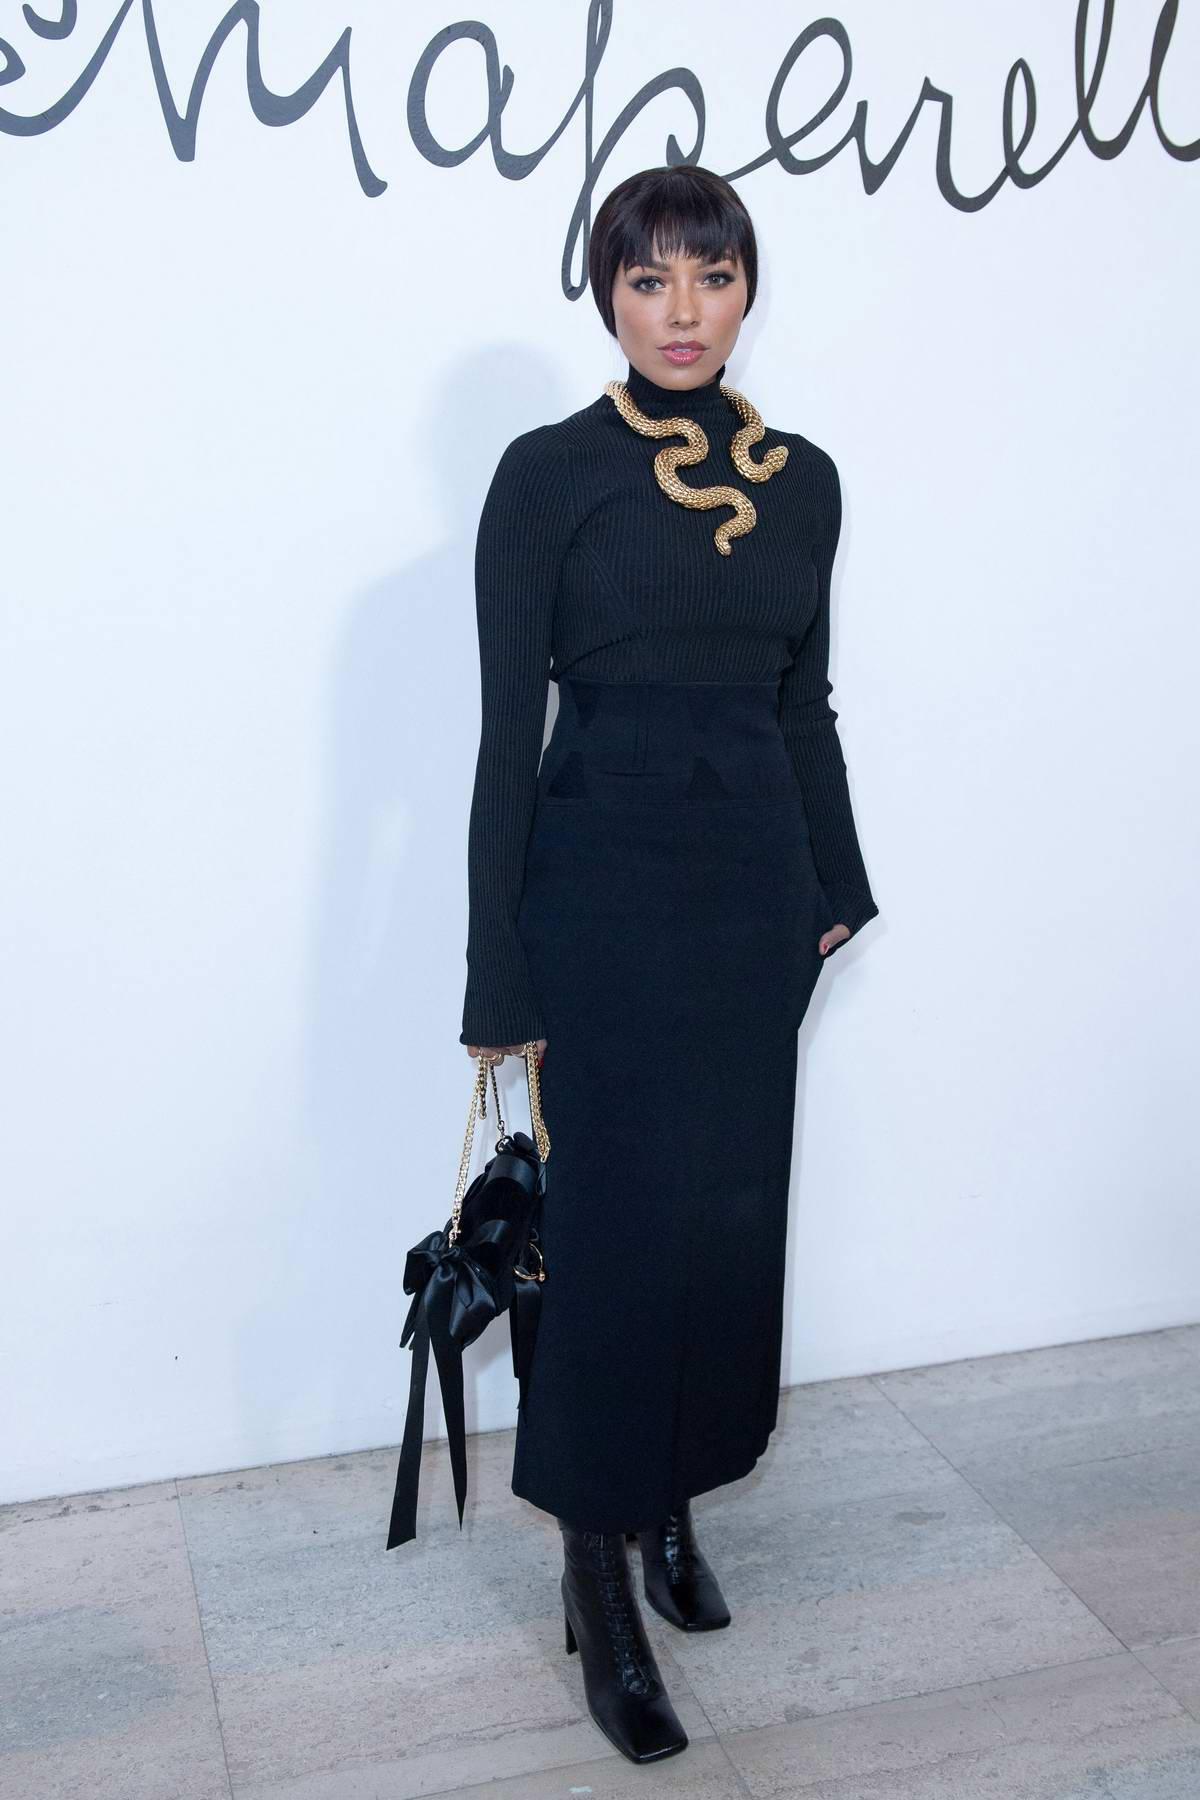 Kat Graham attends the Schiaparelli Haute Couture Spring/Summer 2020 show in Paris, France